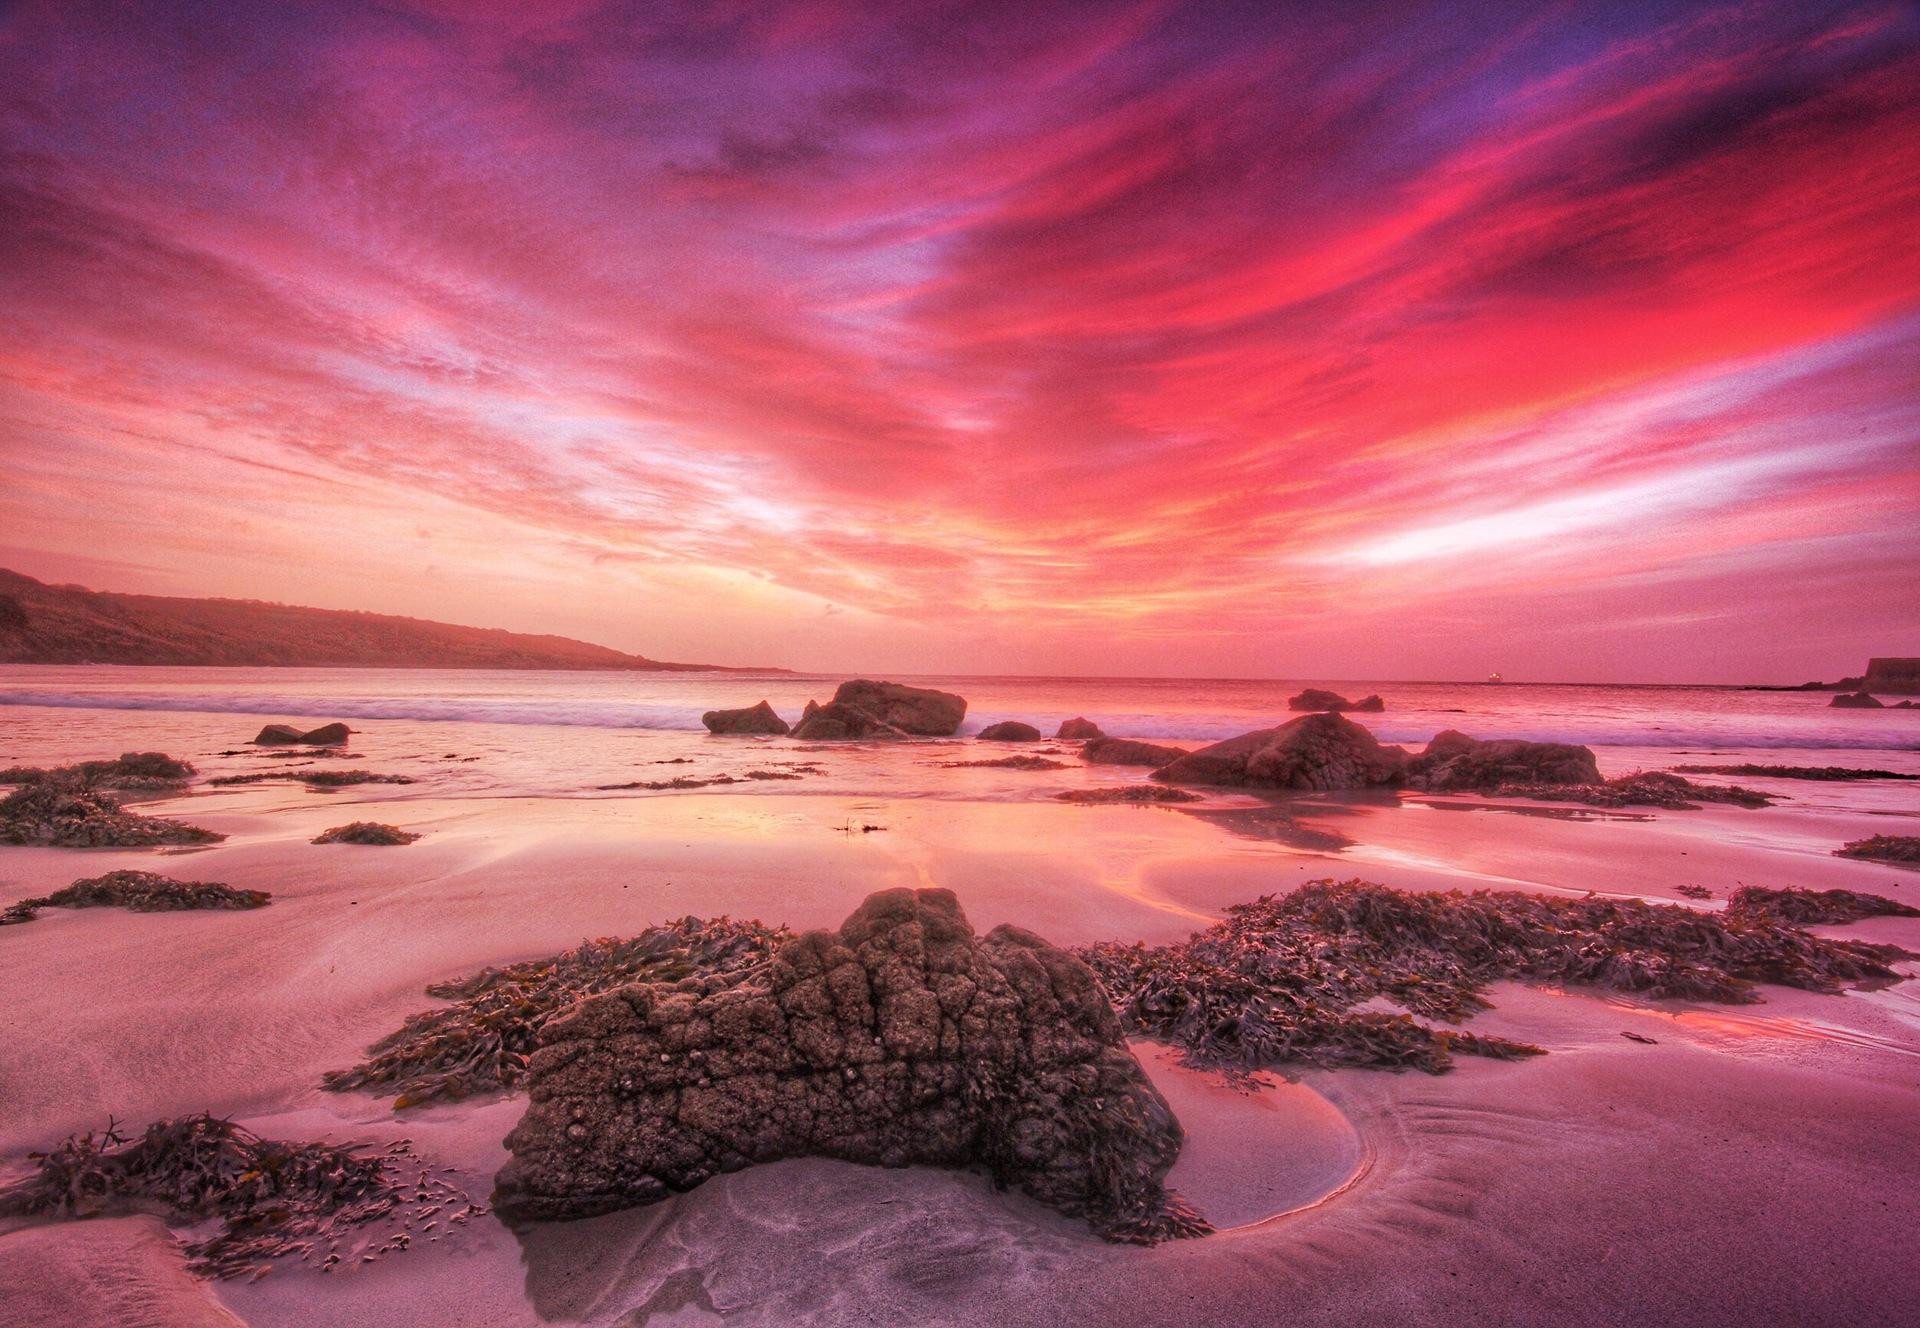 Dramatic sky reflecting in sea